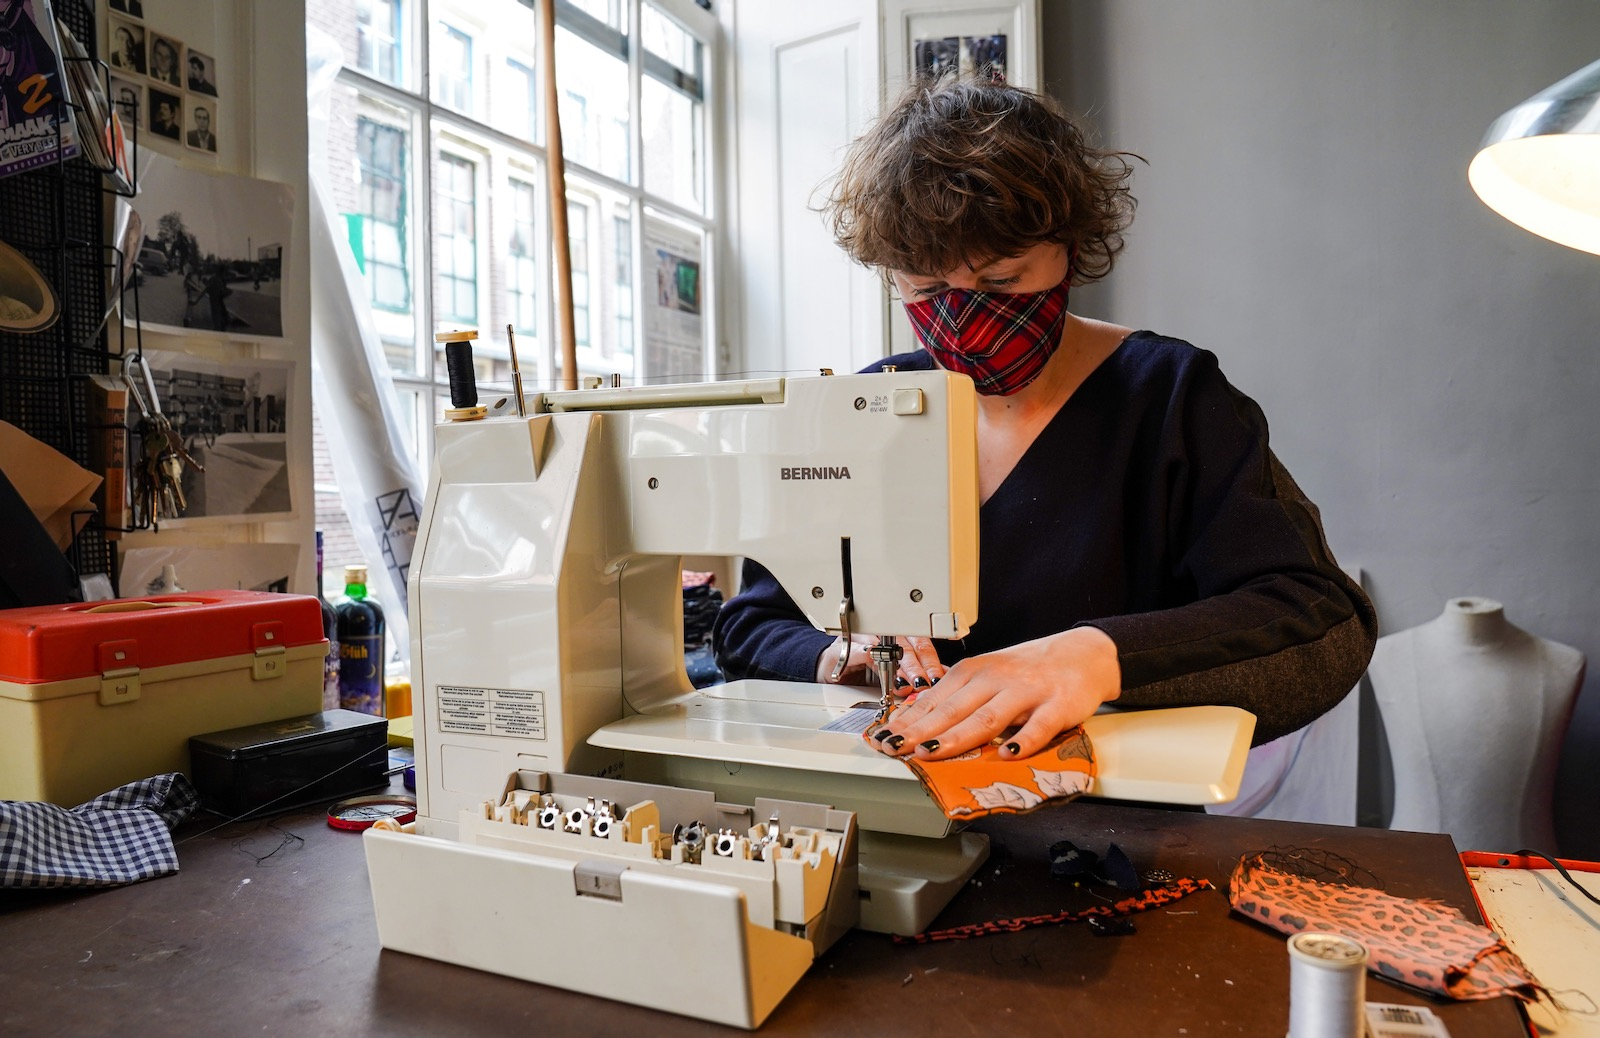 Making face masks amid the coronavirus outbreak, Haarlem, Netherlands, April 4, 2020